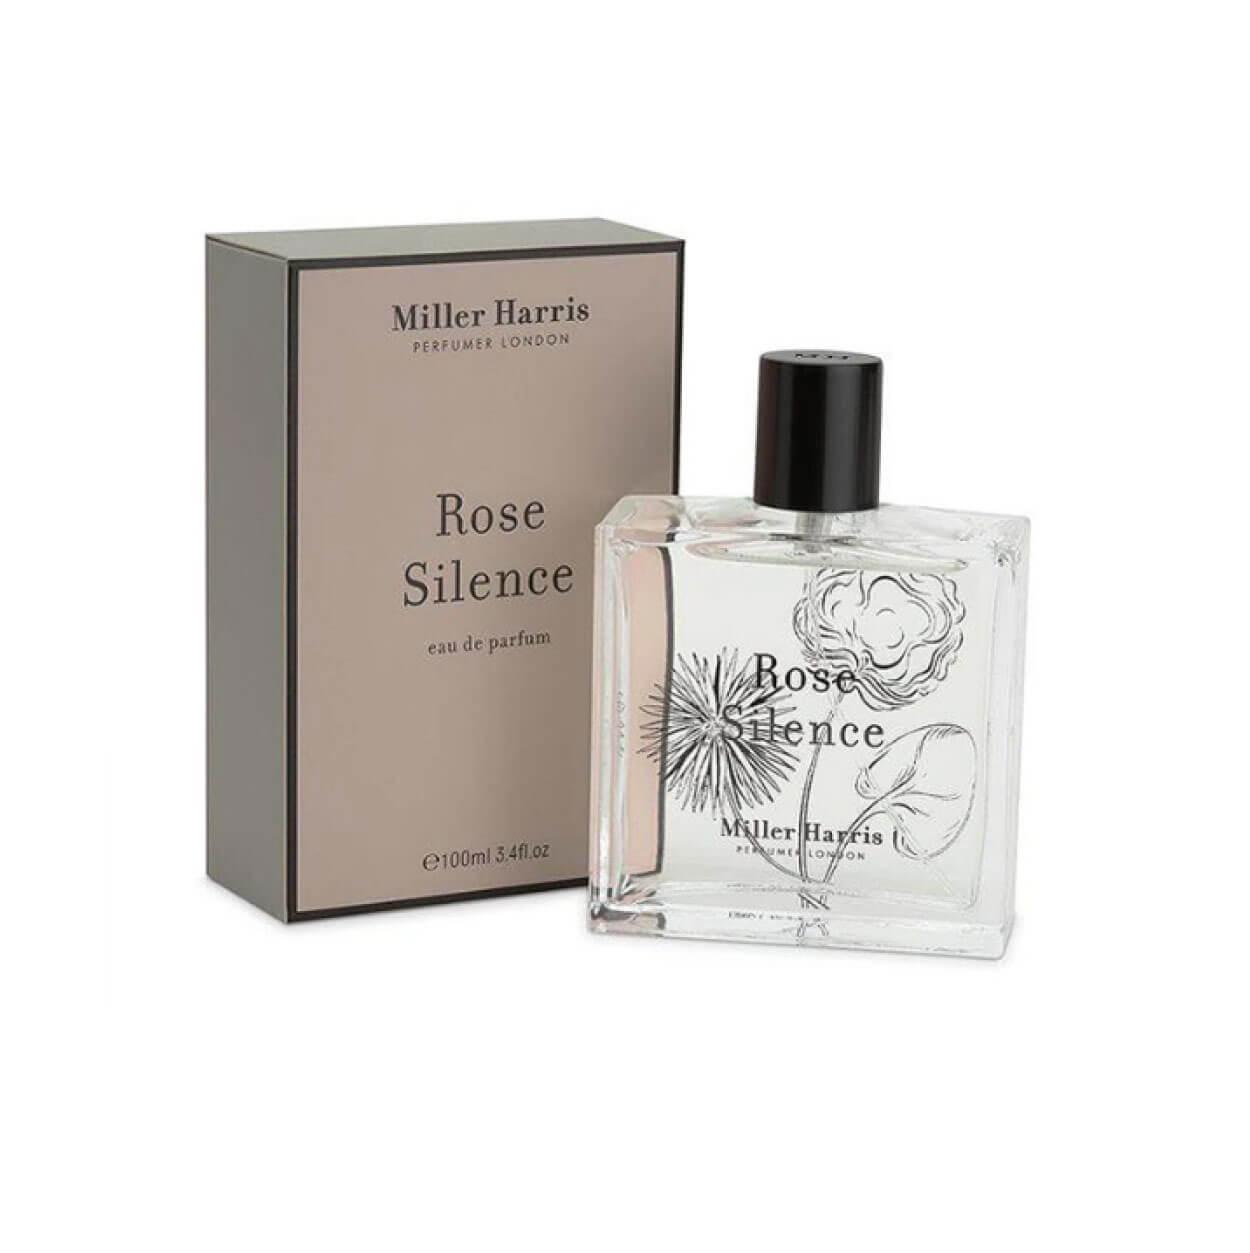 Miller Harris Rose Silence EDP 香水 $1,080/100ml